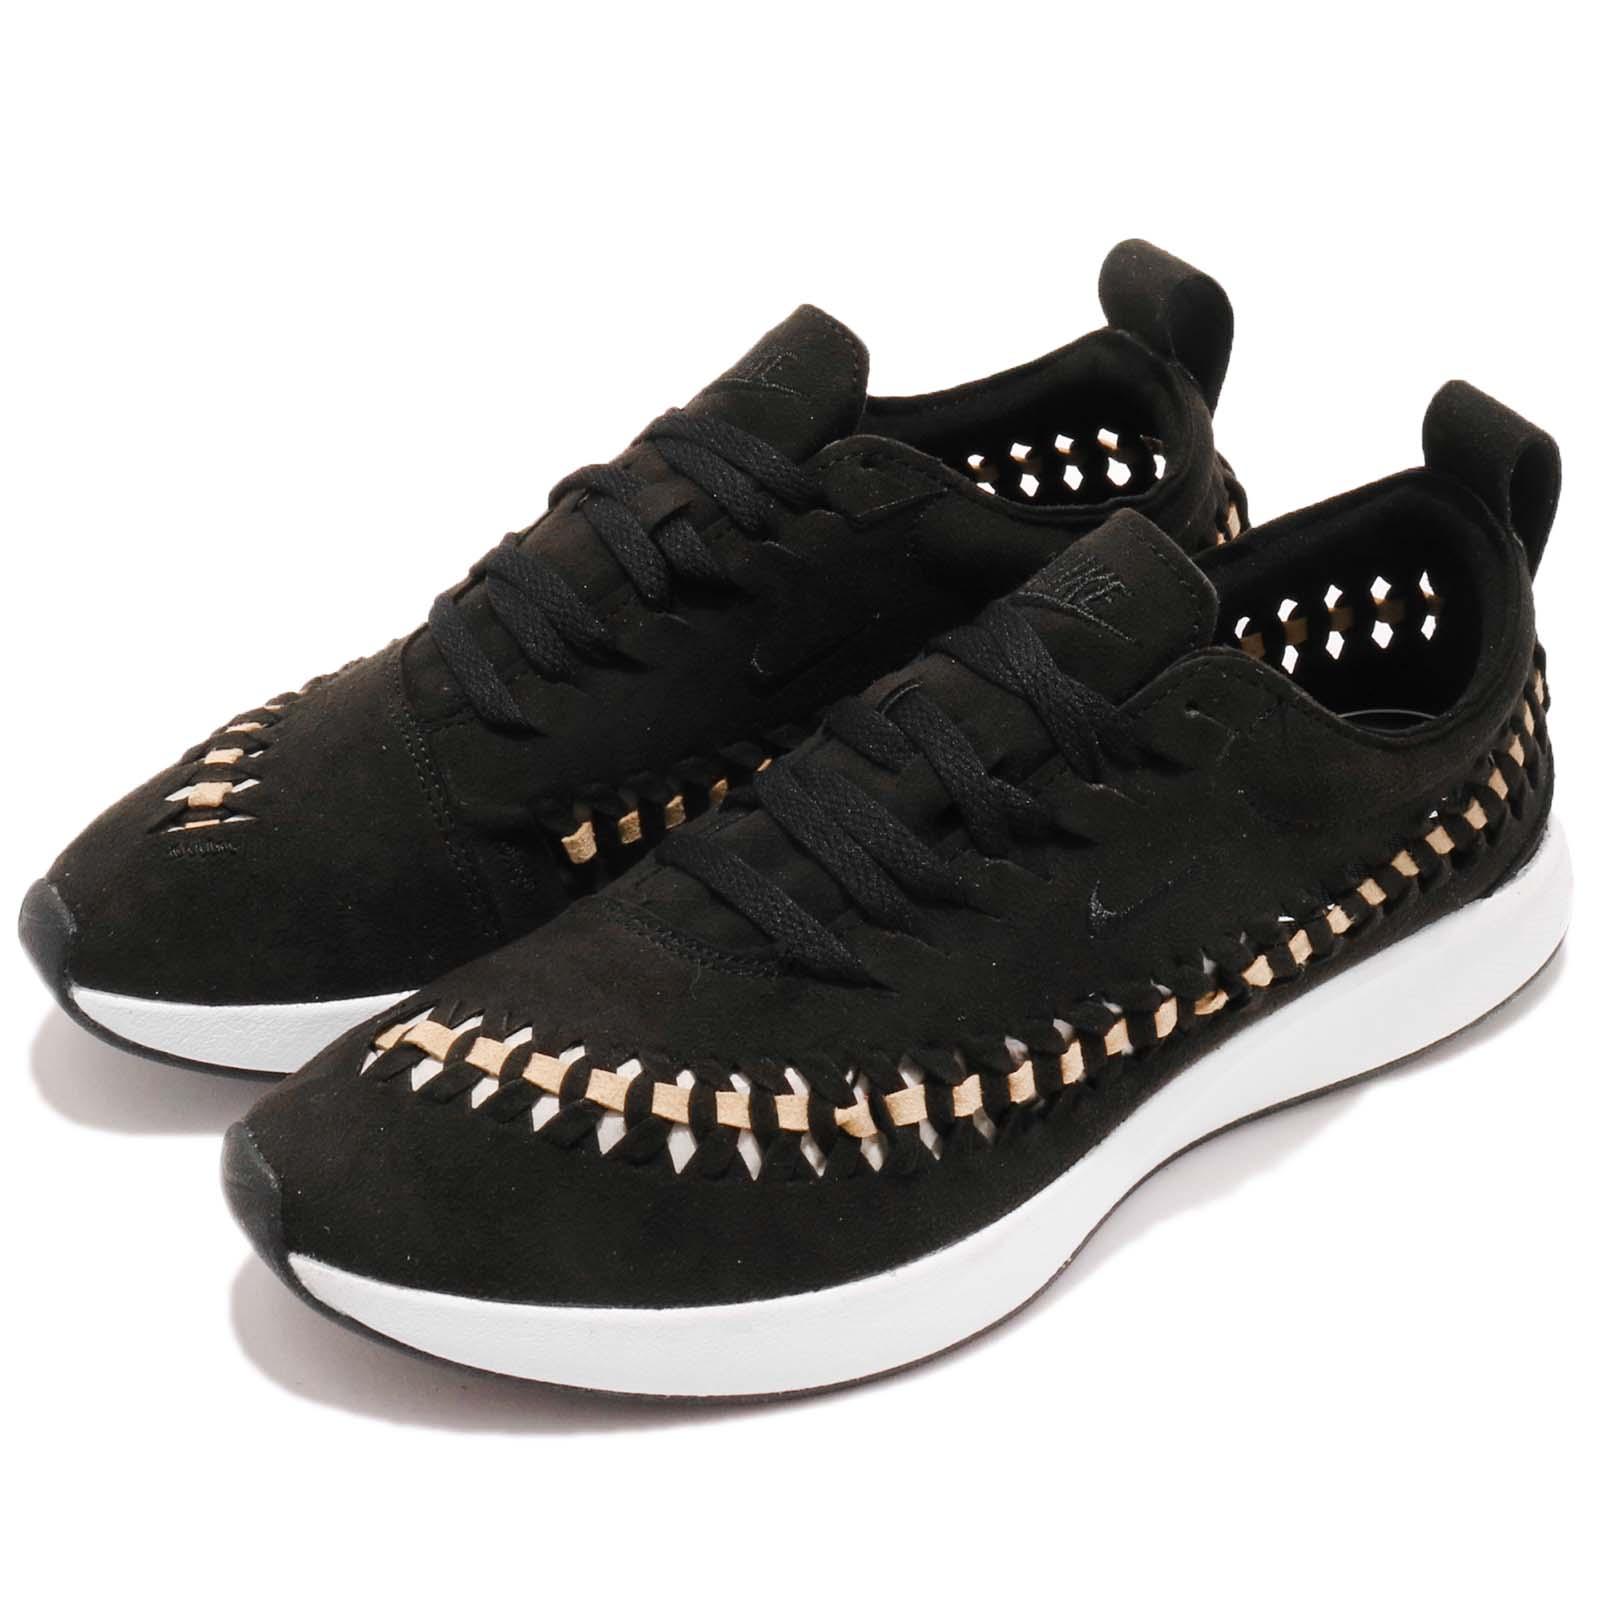 Nike 慢跑鞋 Dualtone Racer 女鞋 AJ8156-001